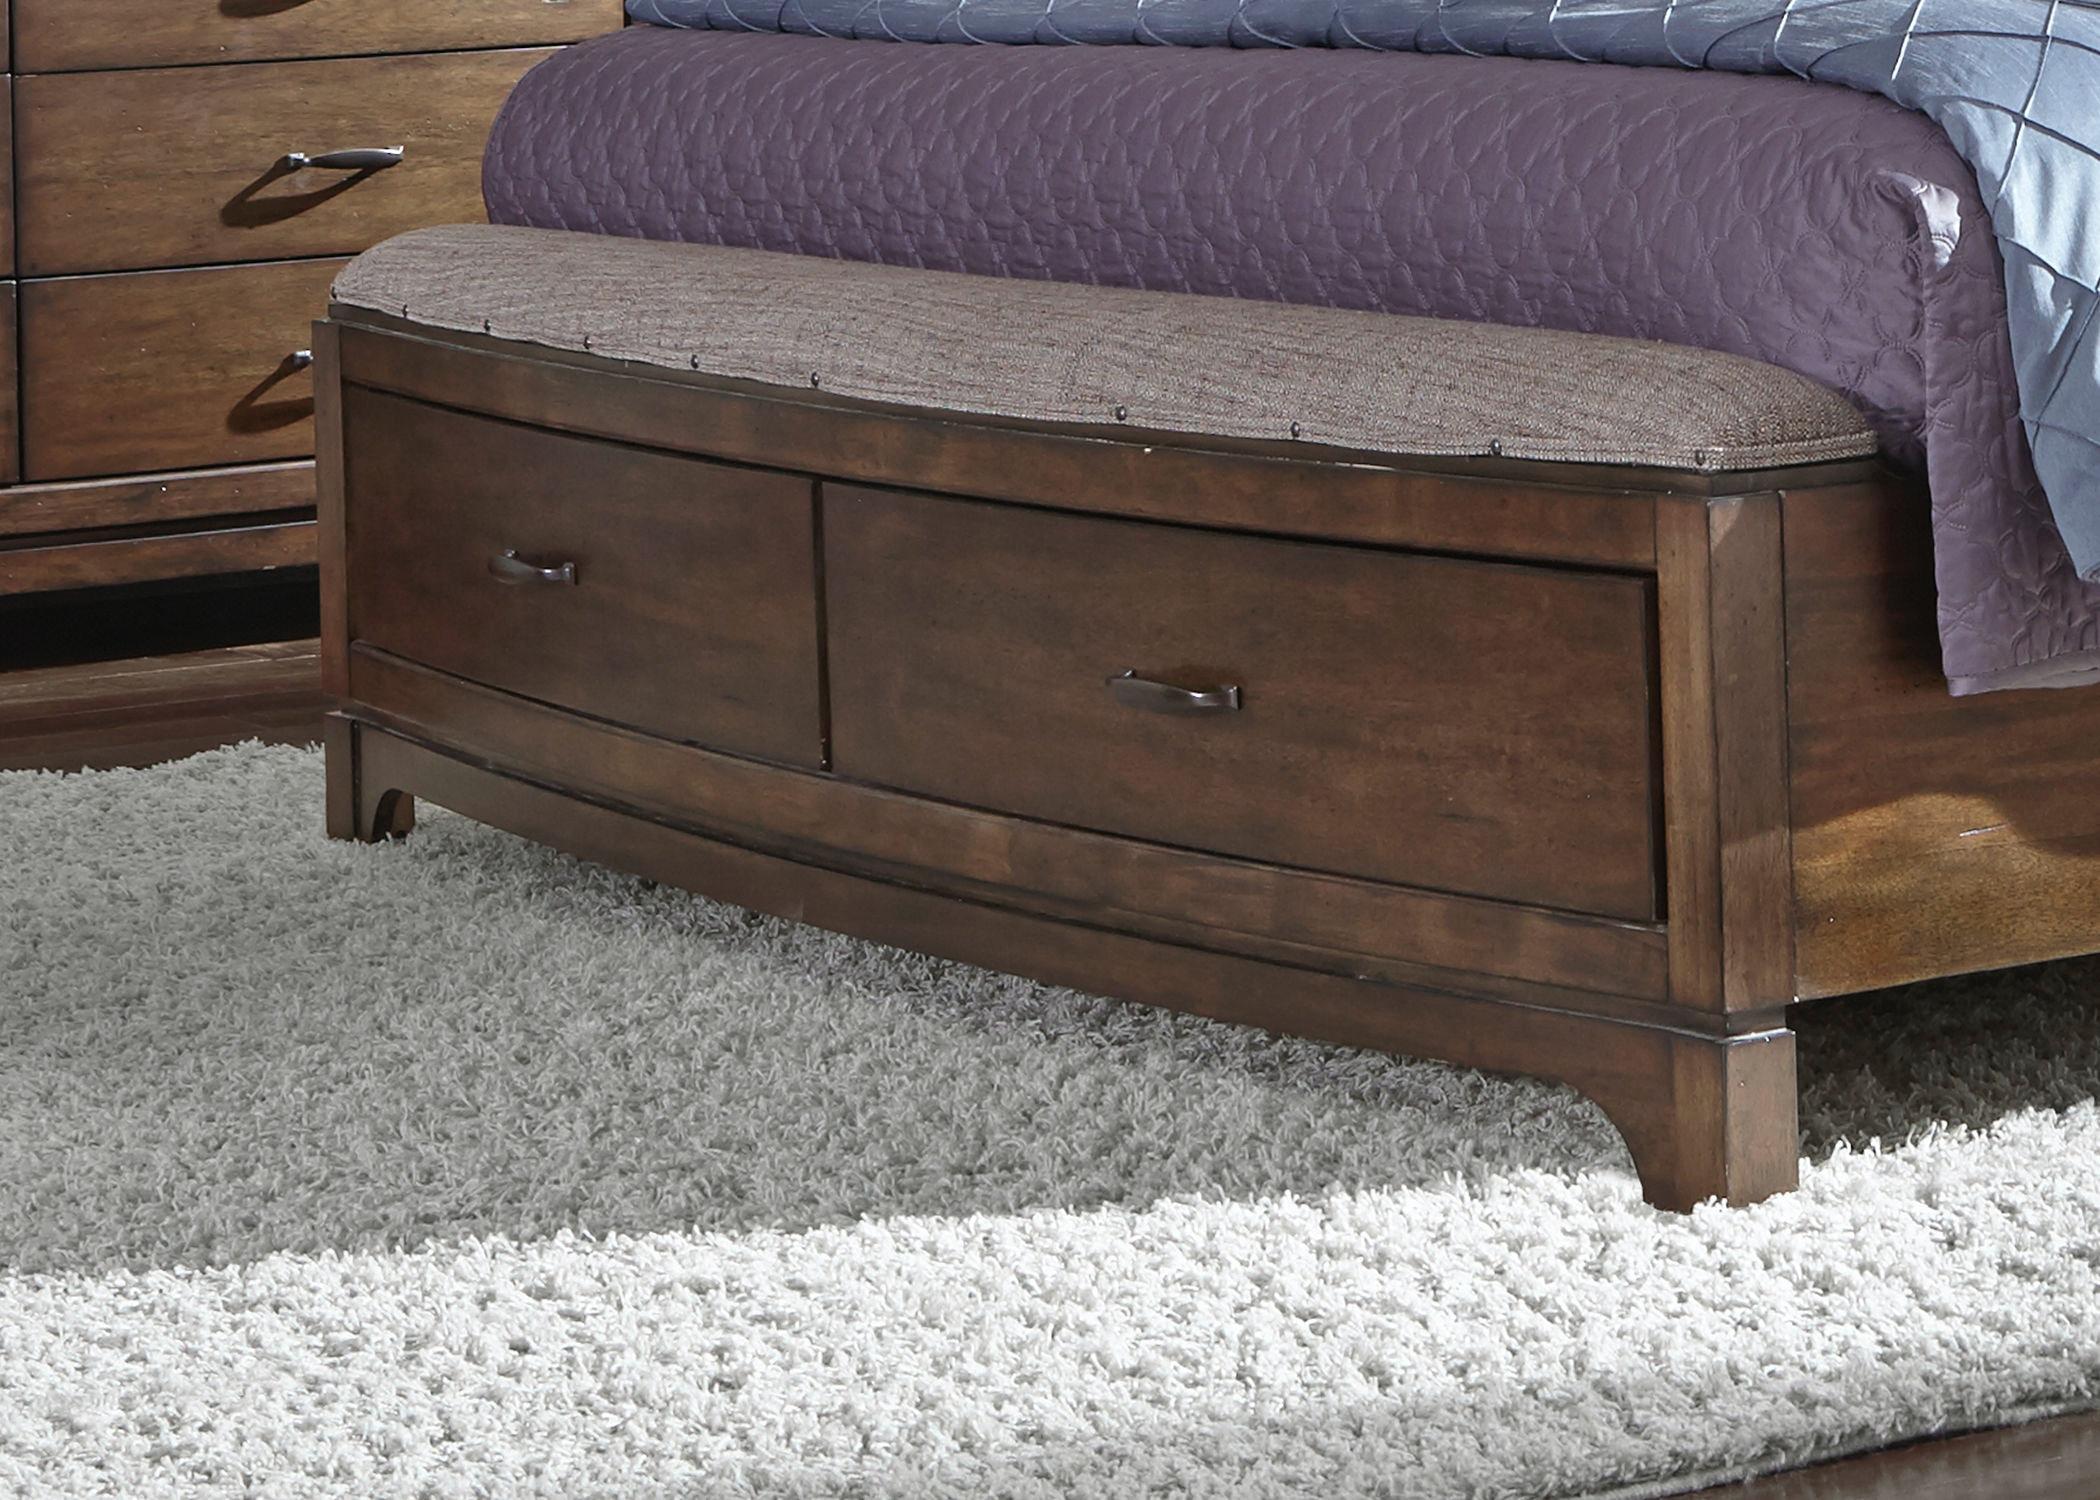 Liberty Furniture Queen Storage Footboard 705 BR23FS At Gustafsonu0027s  Furniture And Mattress